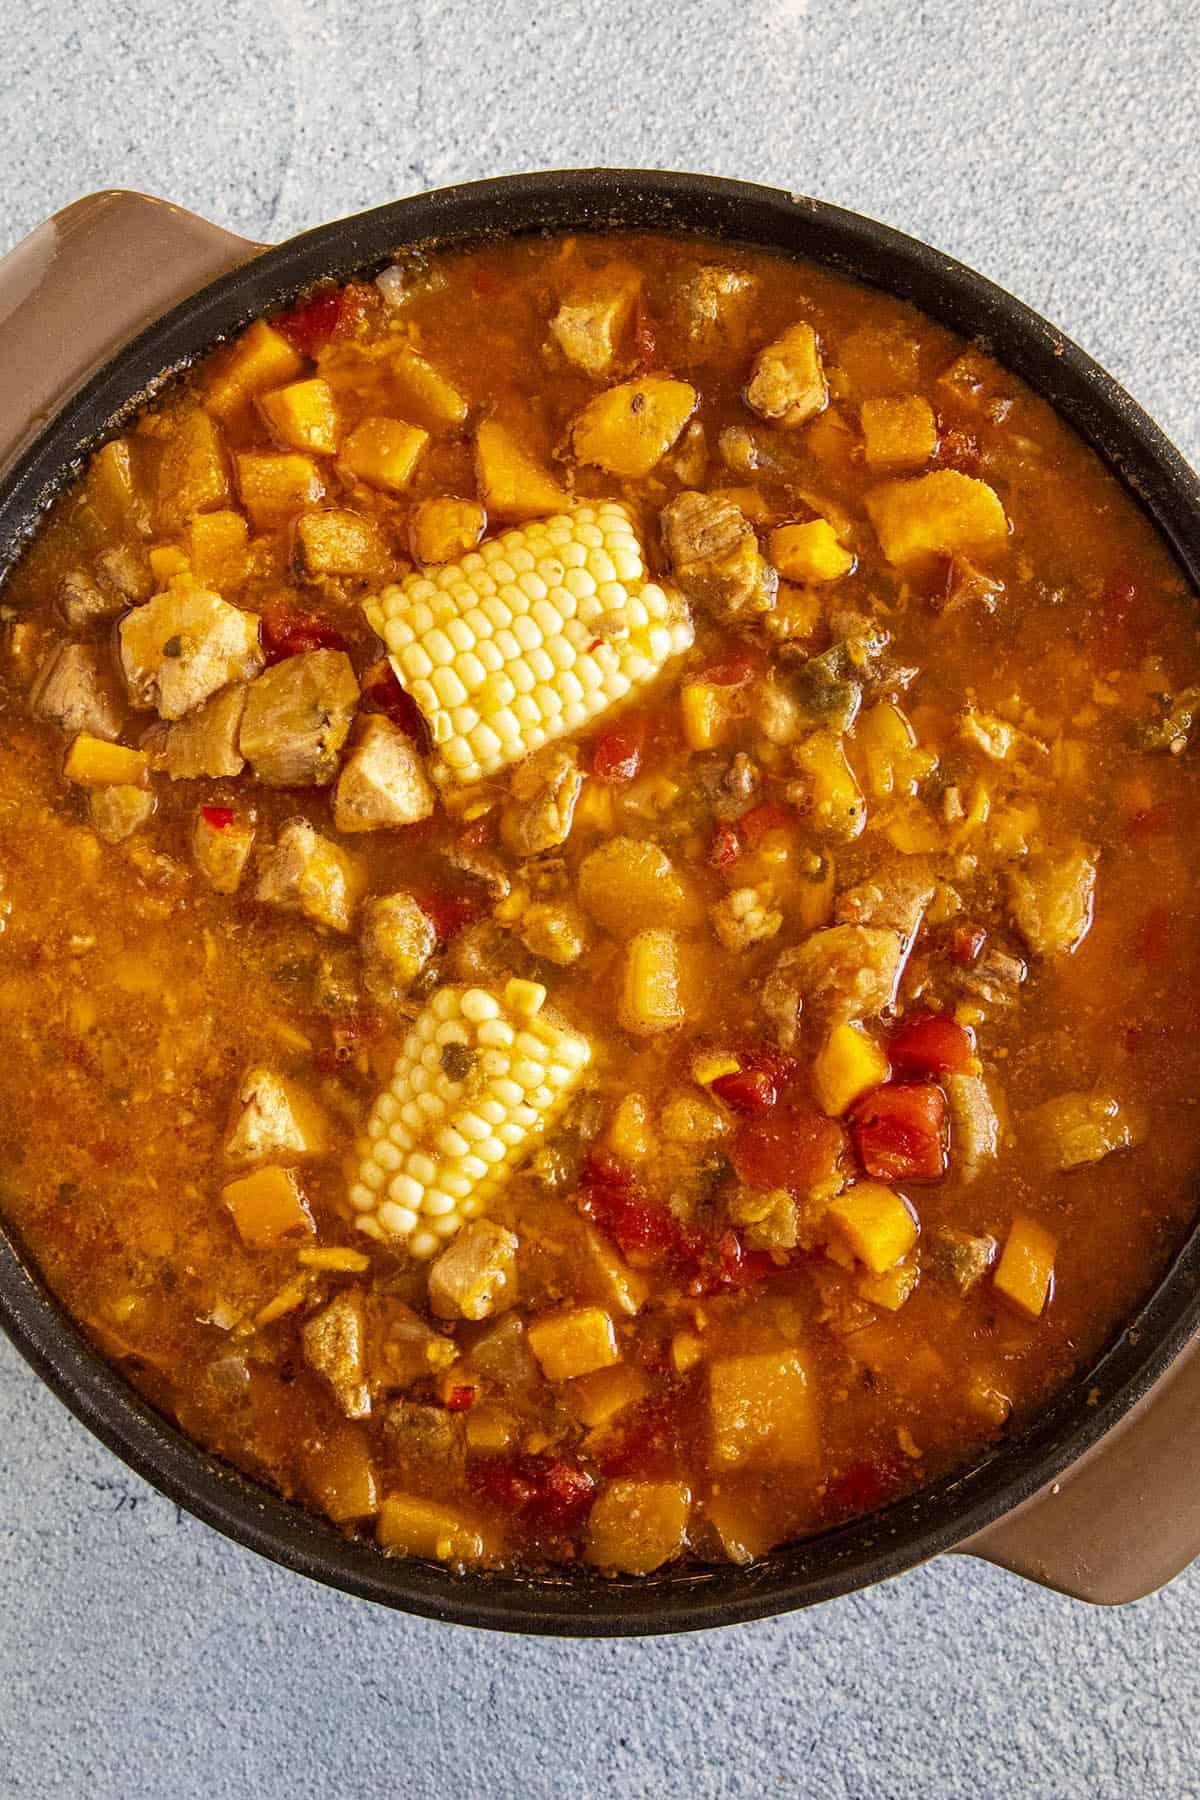 Simmering the Sancocho in a pot